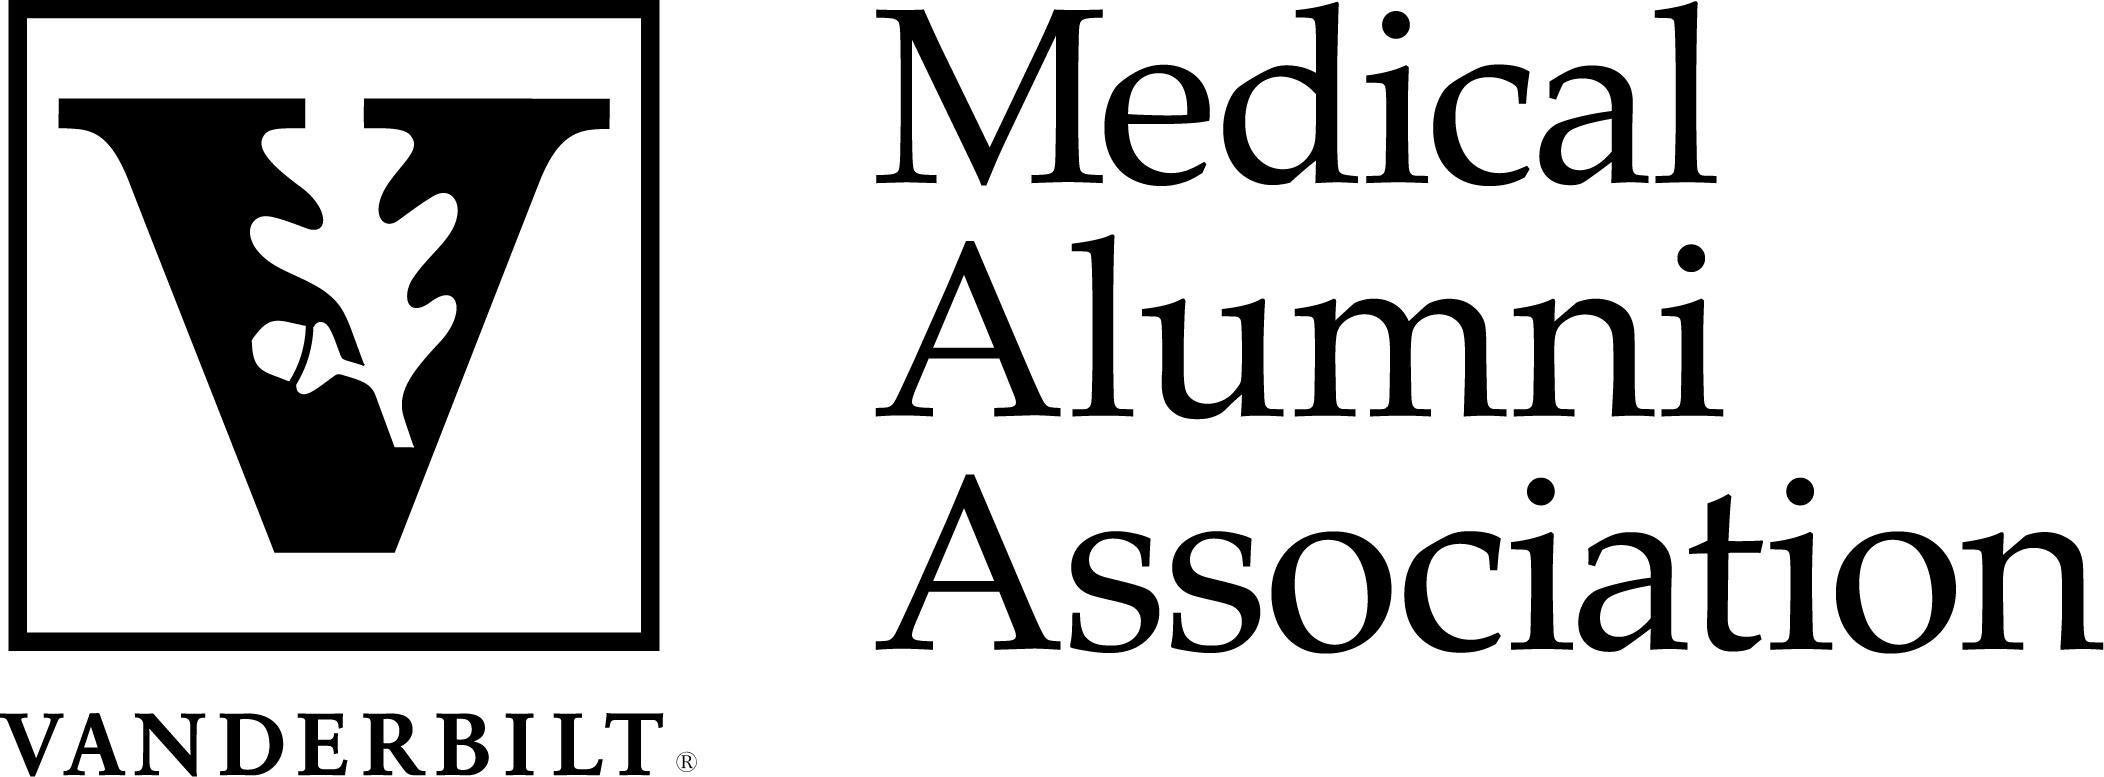 Vanderbilt Medical Alumni Association width=